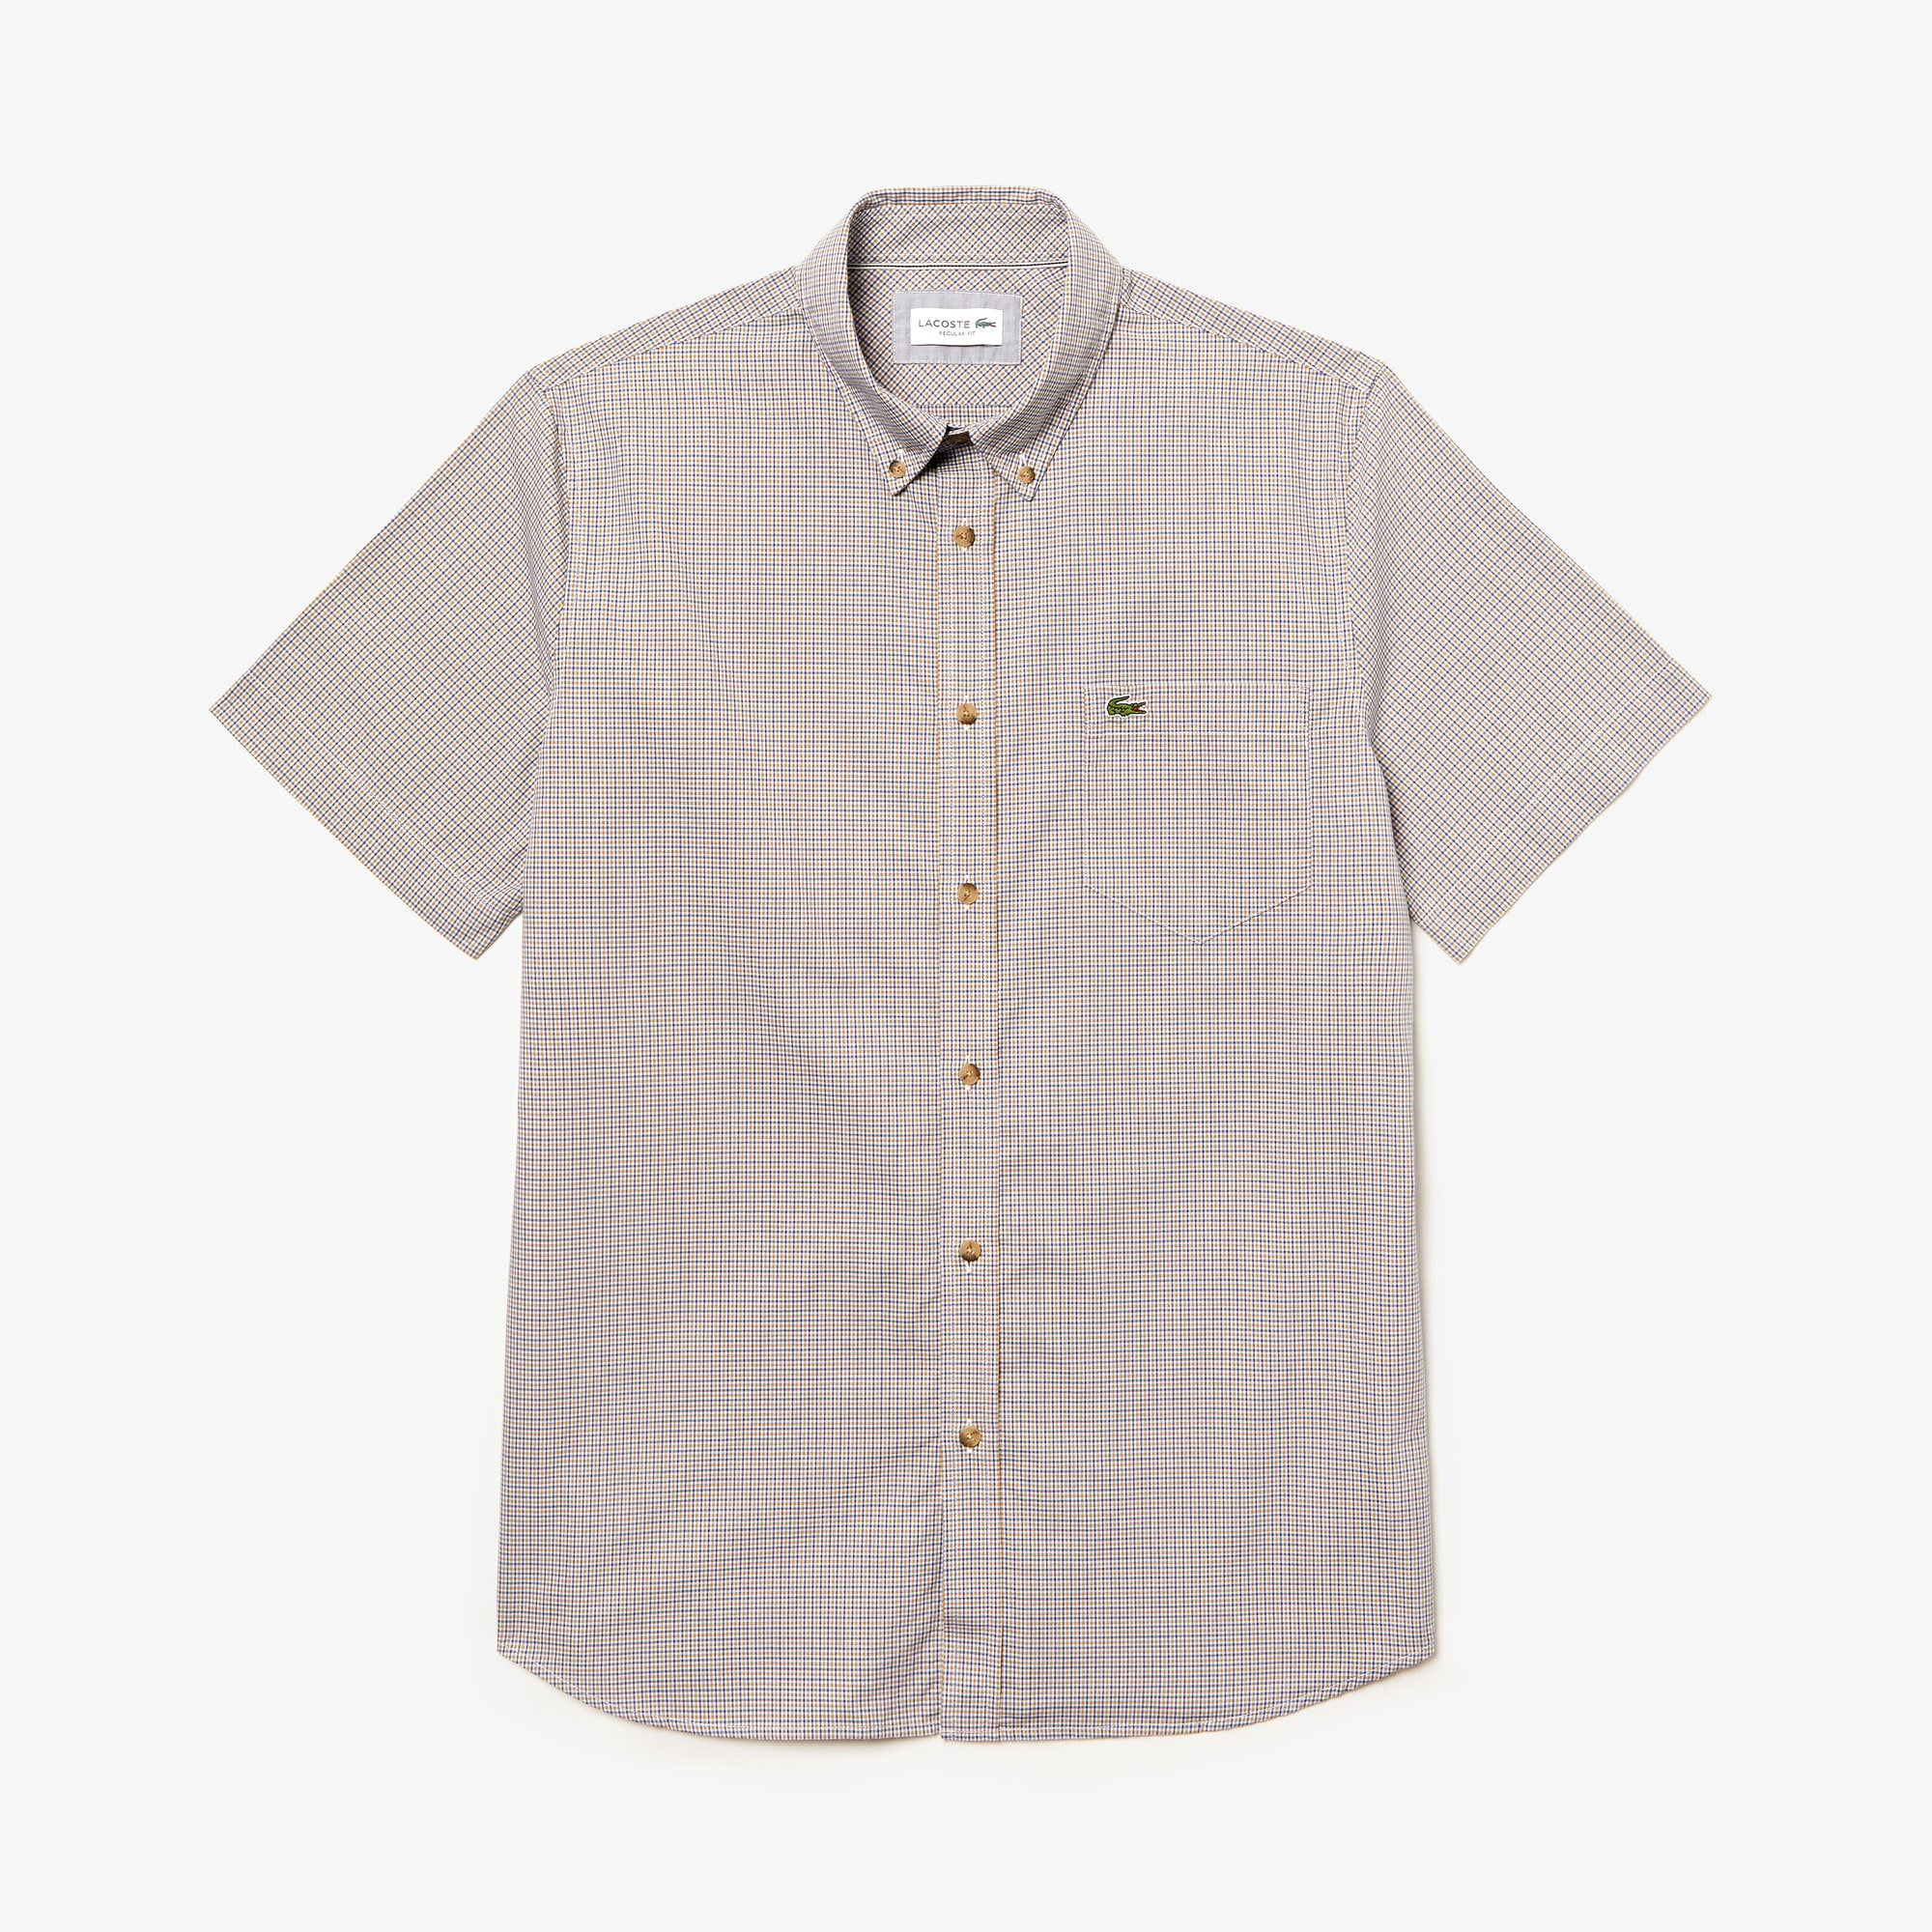 228144d0 Button Down Shirts | Men's Fashion | LACOSTE